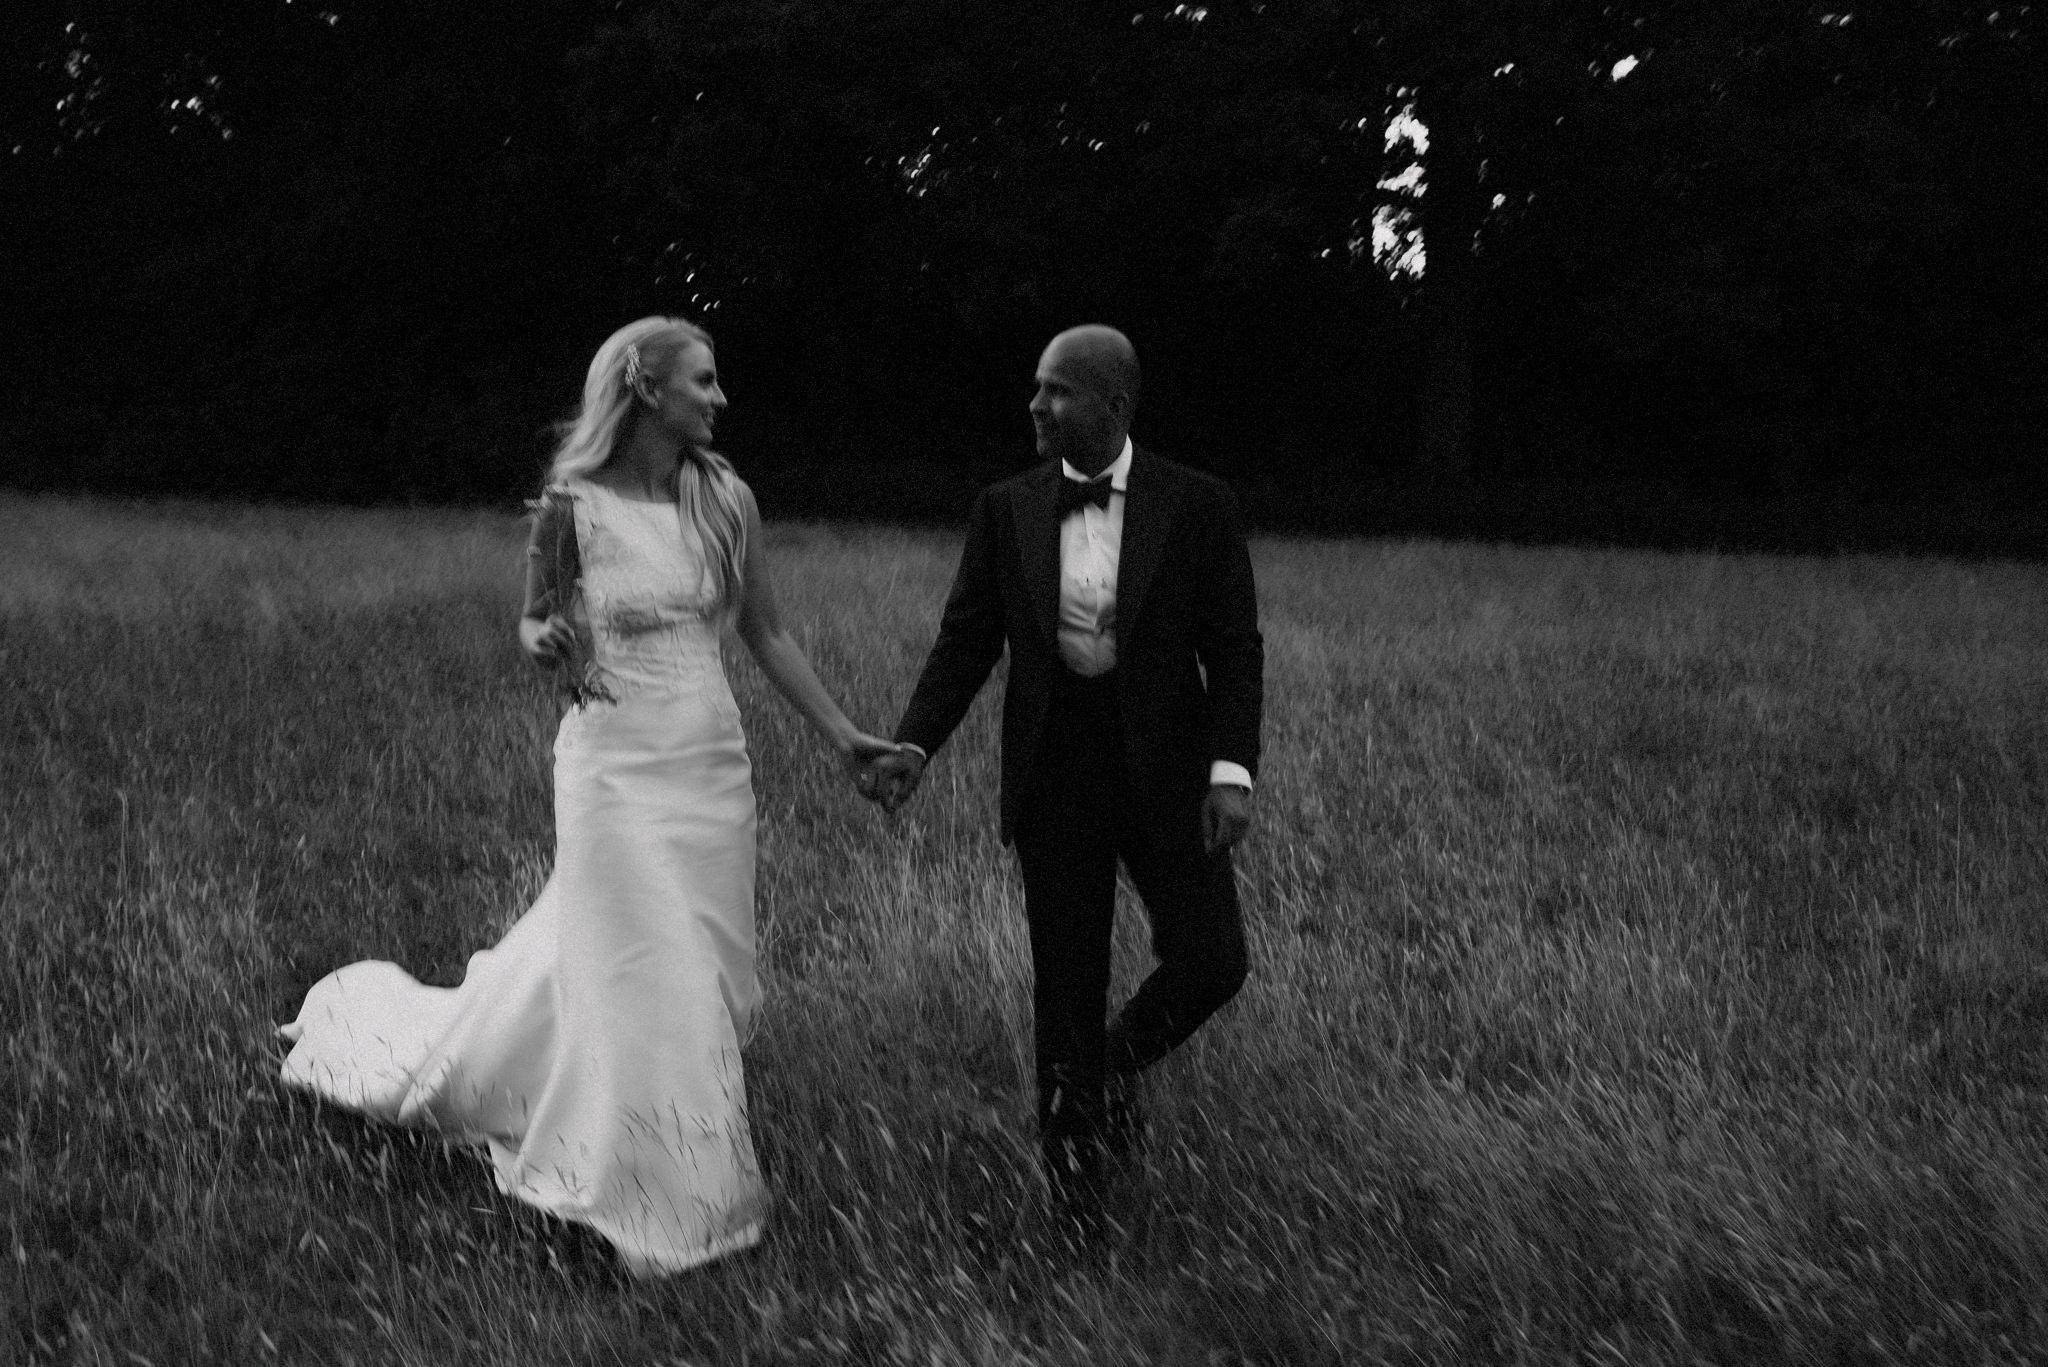 Bruidsfotografie Buitenplaats Sparrendaal - Naomi van der Kraan 0080.jpg